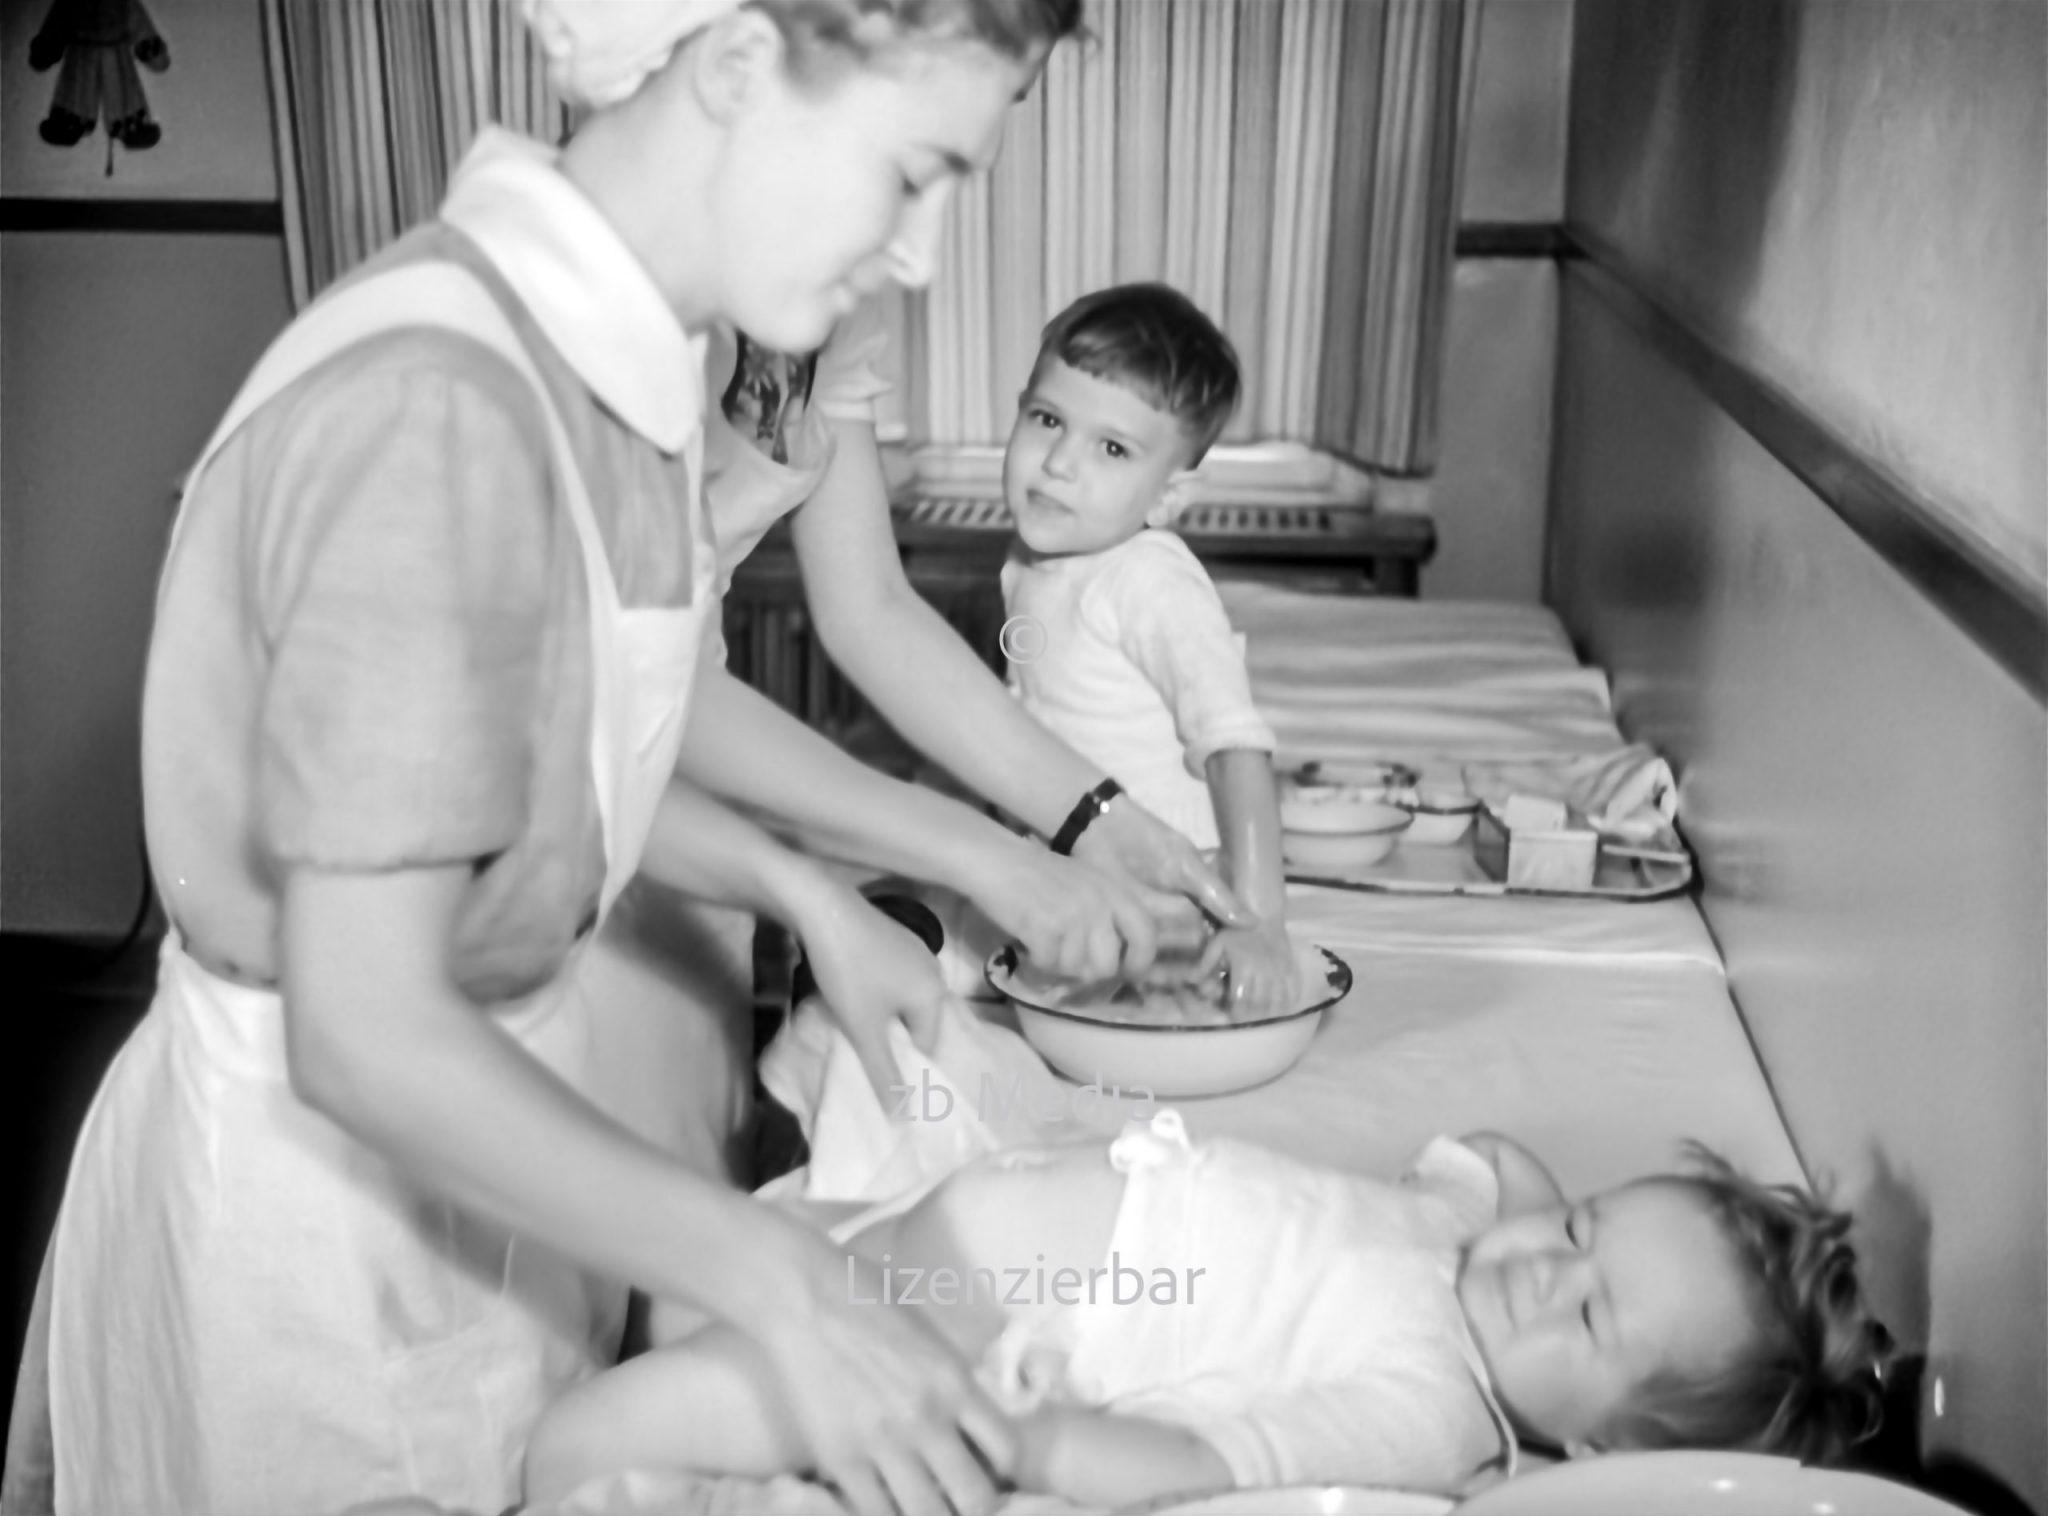 Kinderpflege im Pestalozzi-Fröbel-Haus Berlin 1937